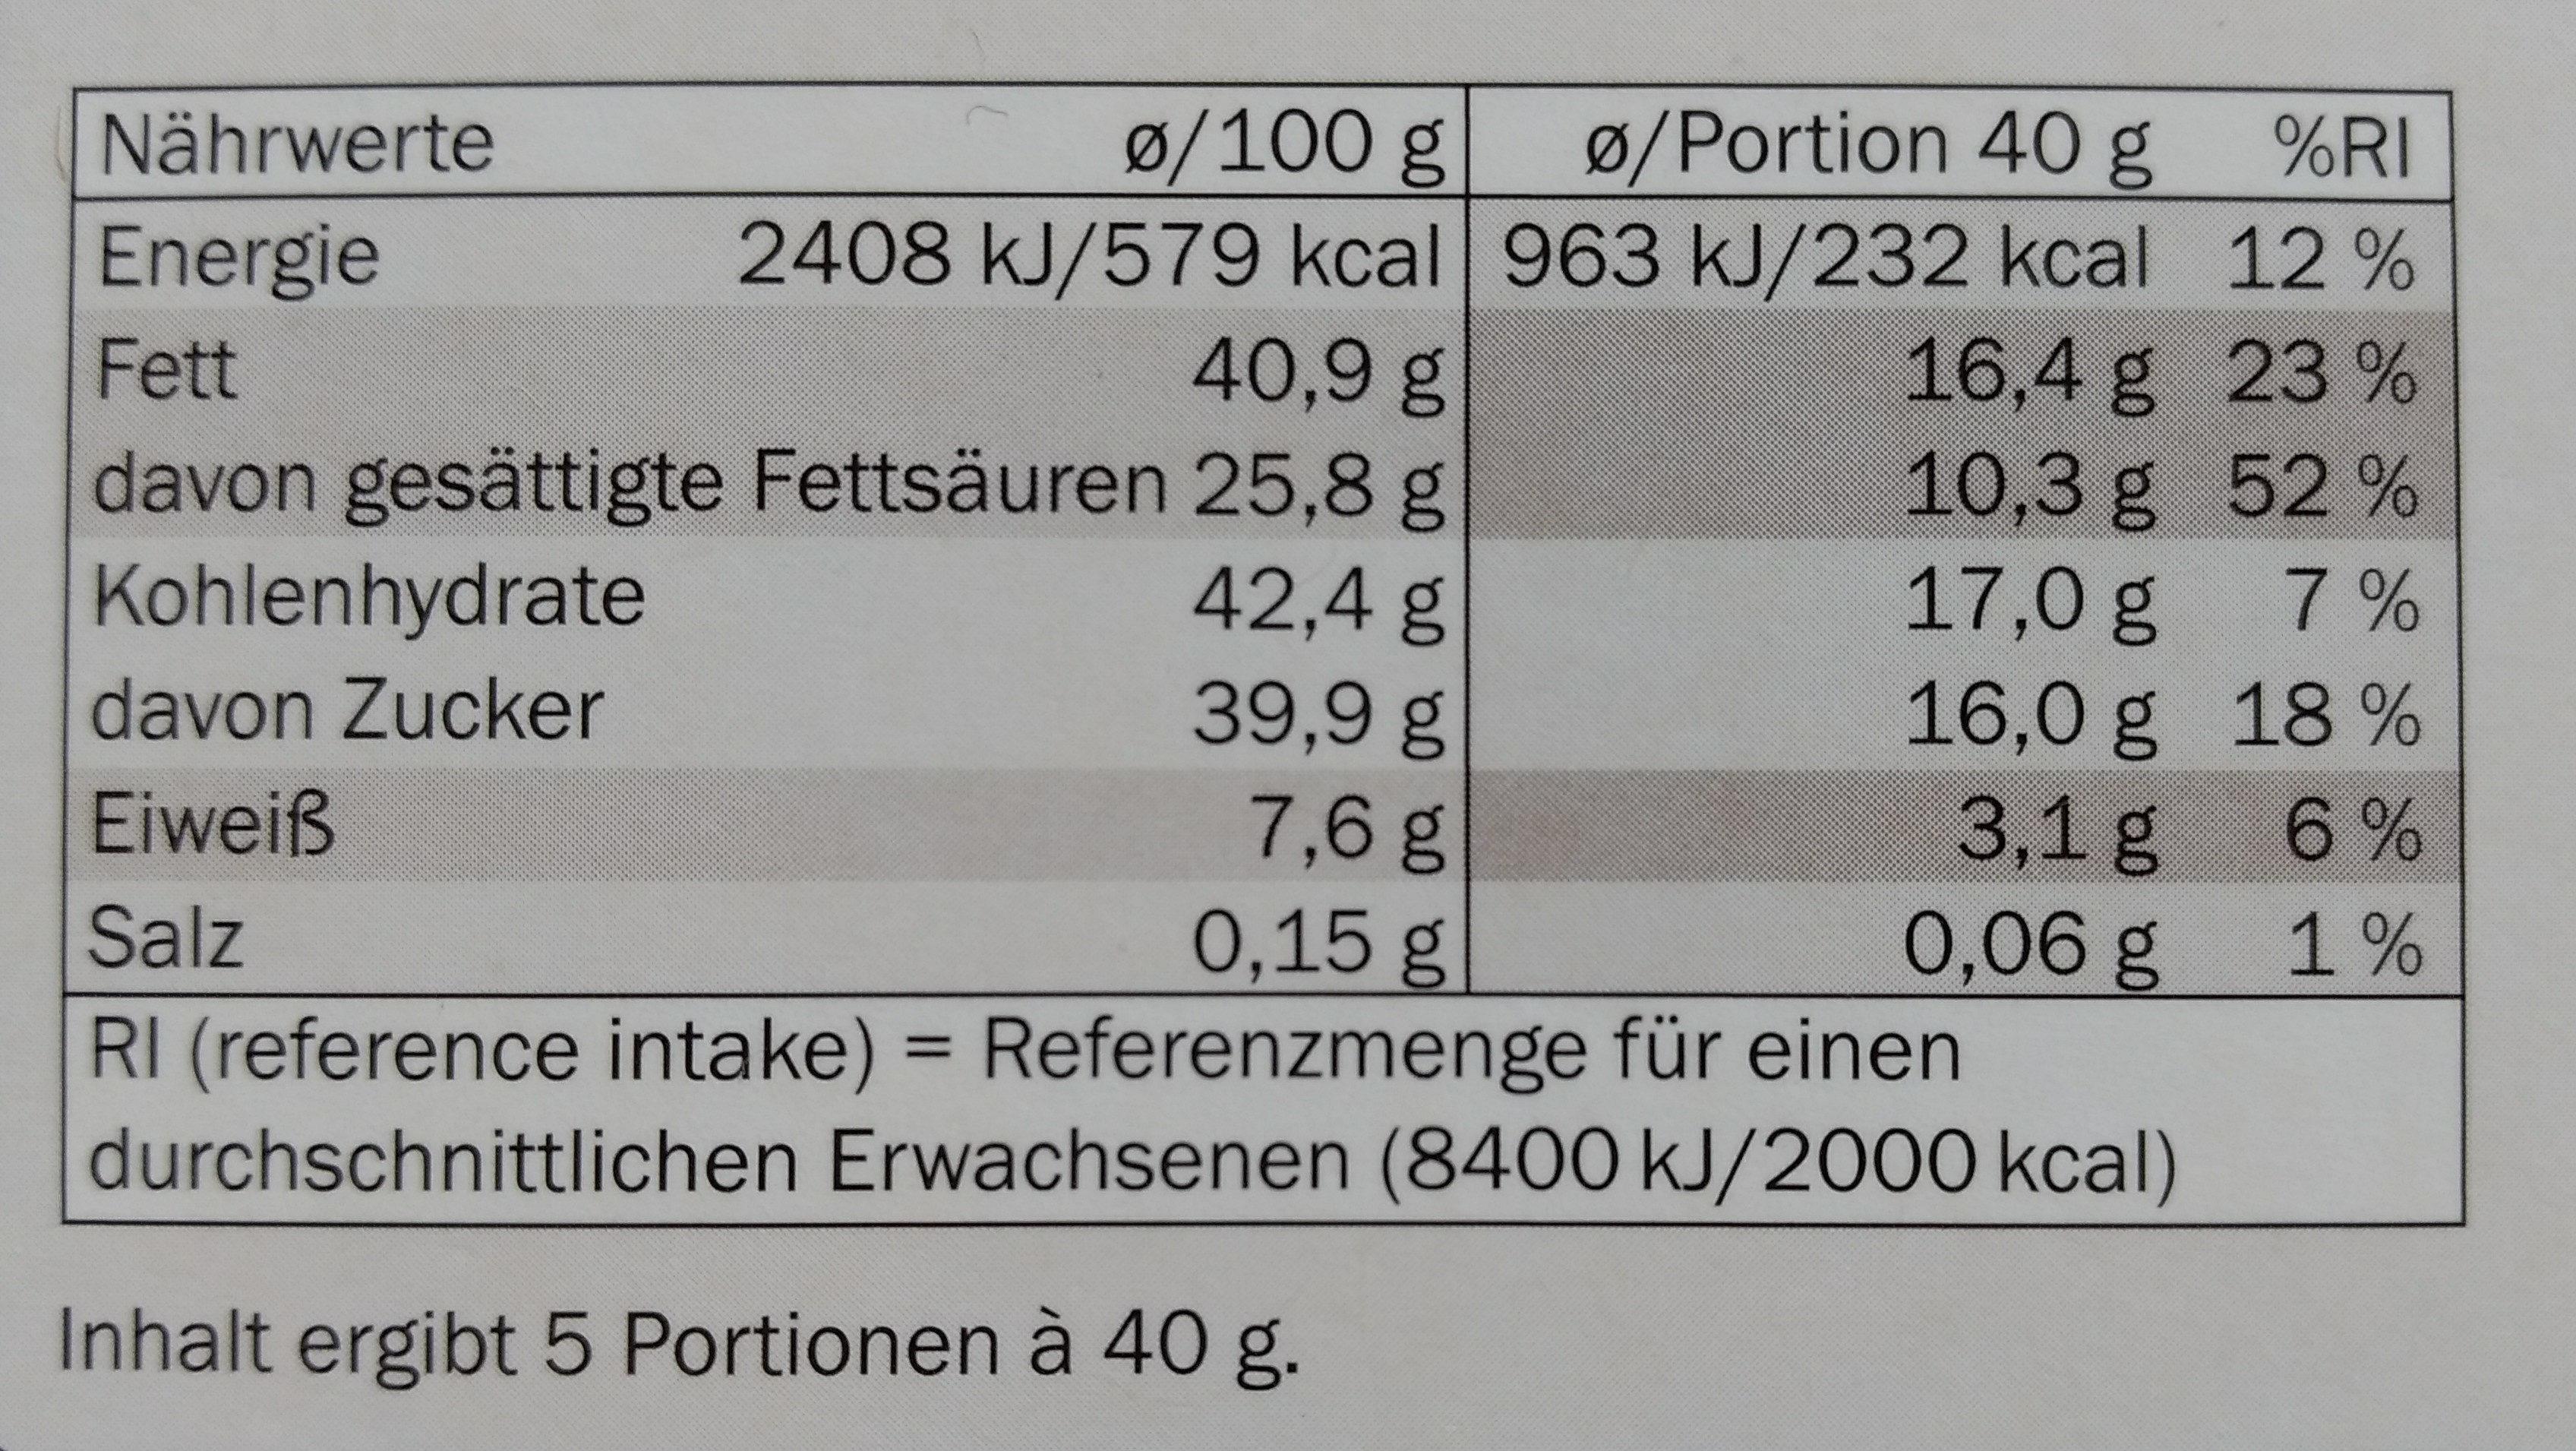 Edel Herbe Sahneschokolade - Nährwertangaben - de